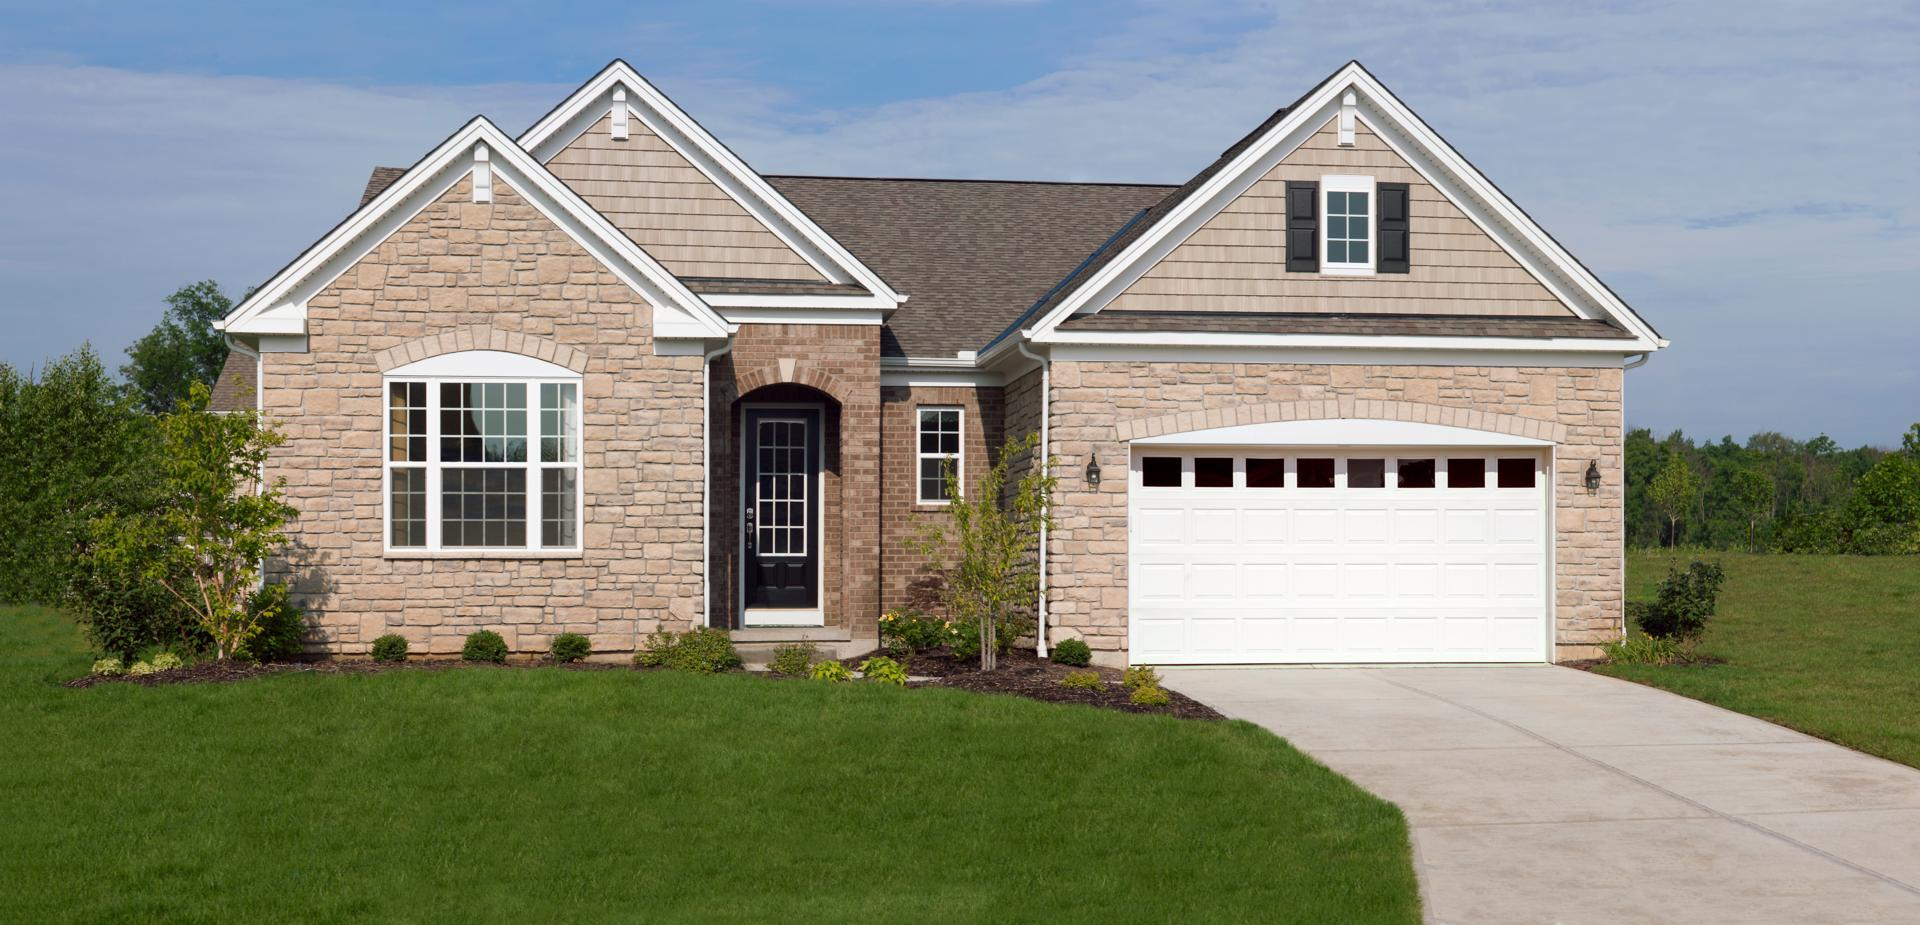 单亲家庭 为 销售 在 Naples 13996 Santos Drive Union, Kentucky 41091 United States